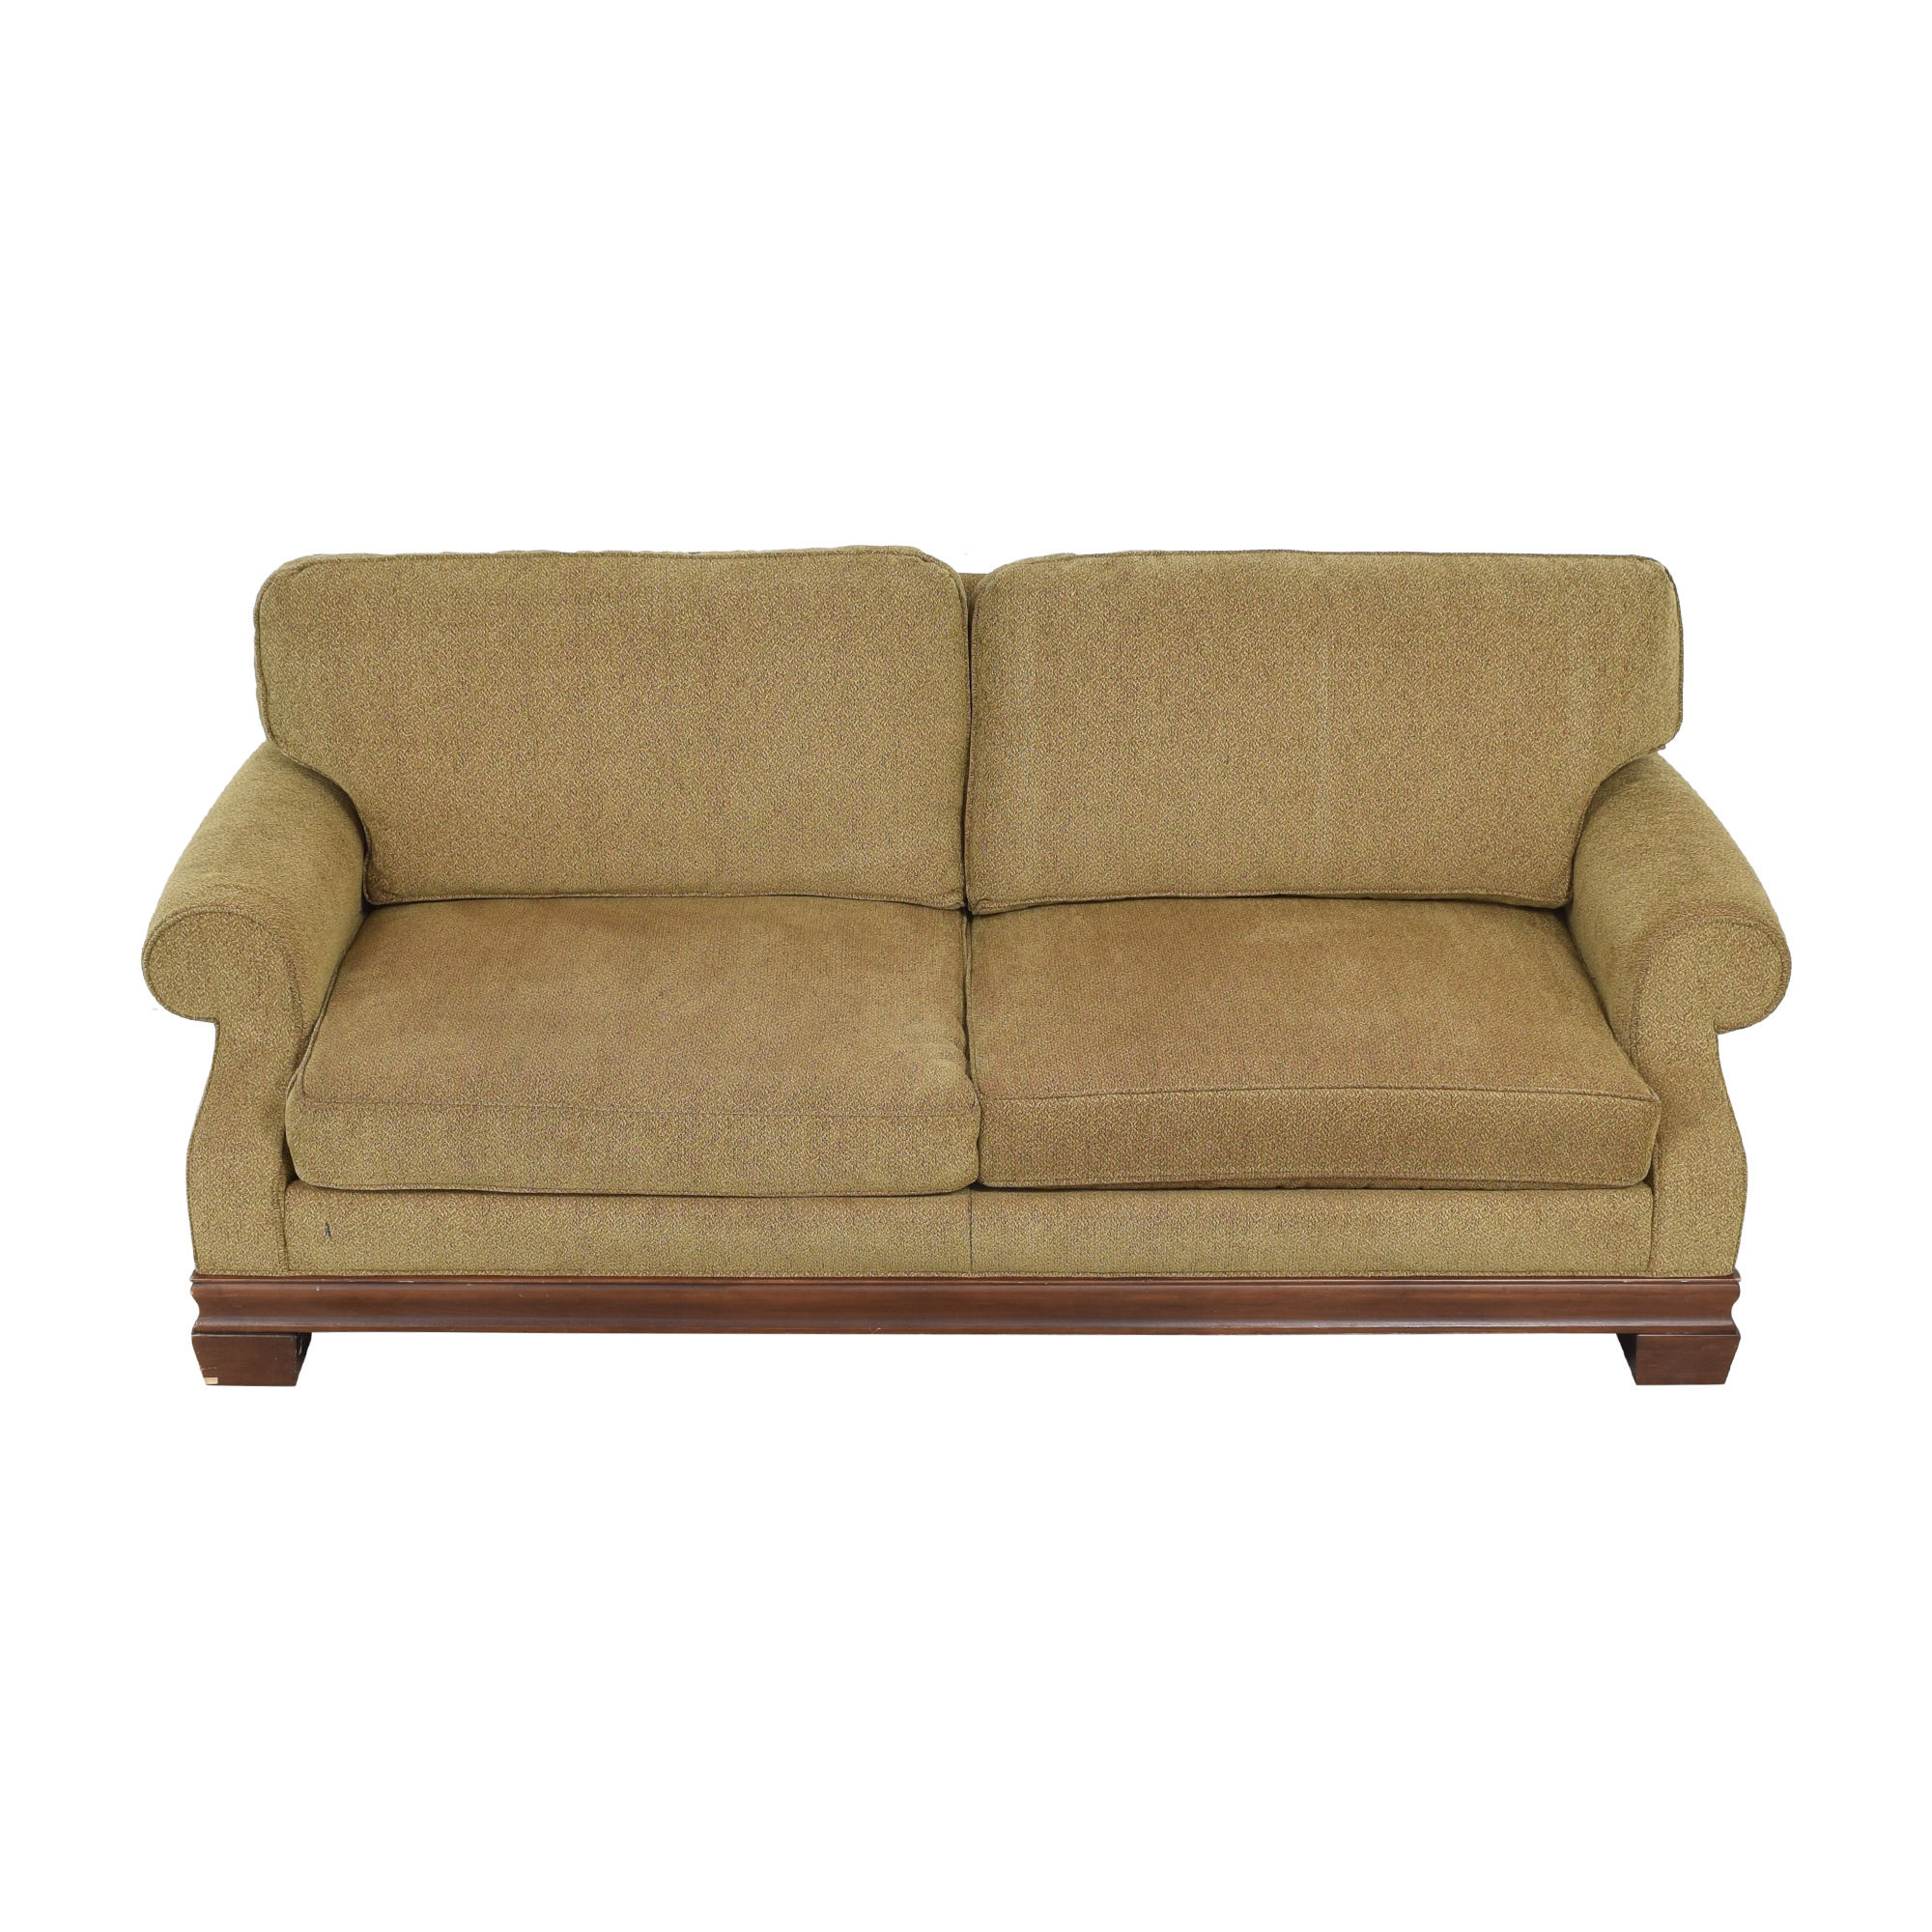 Custom Two Cushion Roll Arm Sofa brown